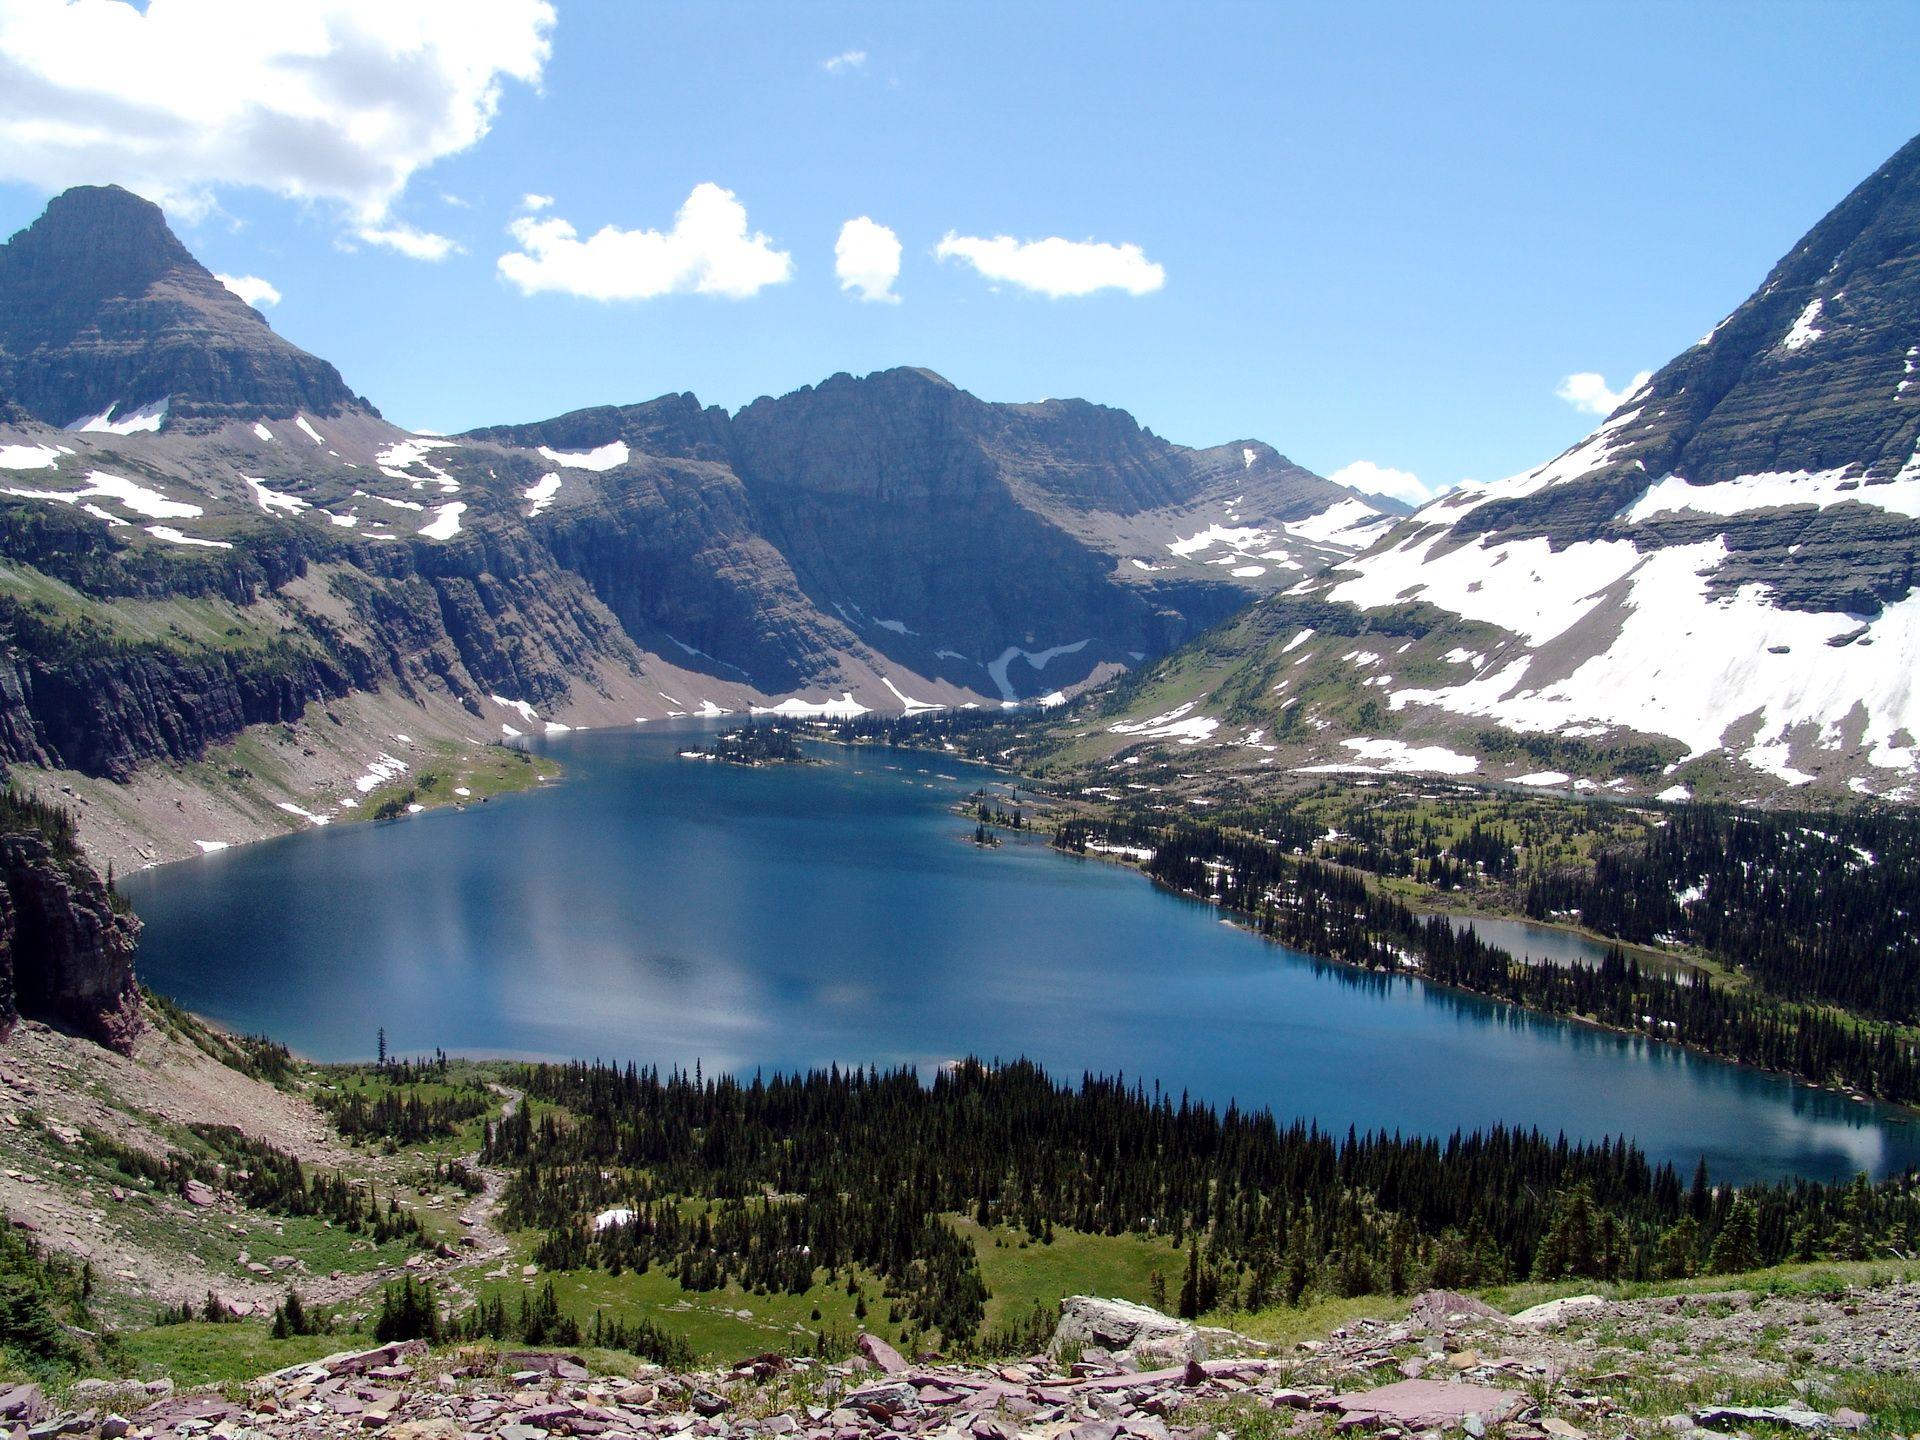 Montana State Parks Hd Glacier National Park Montana